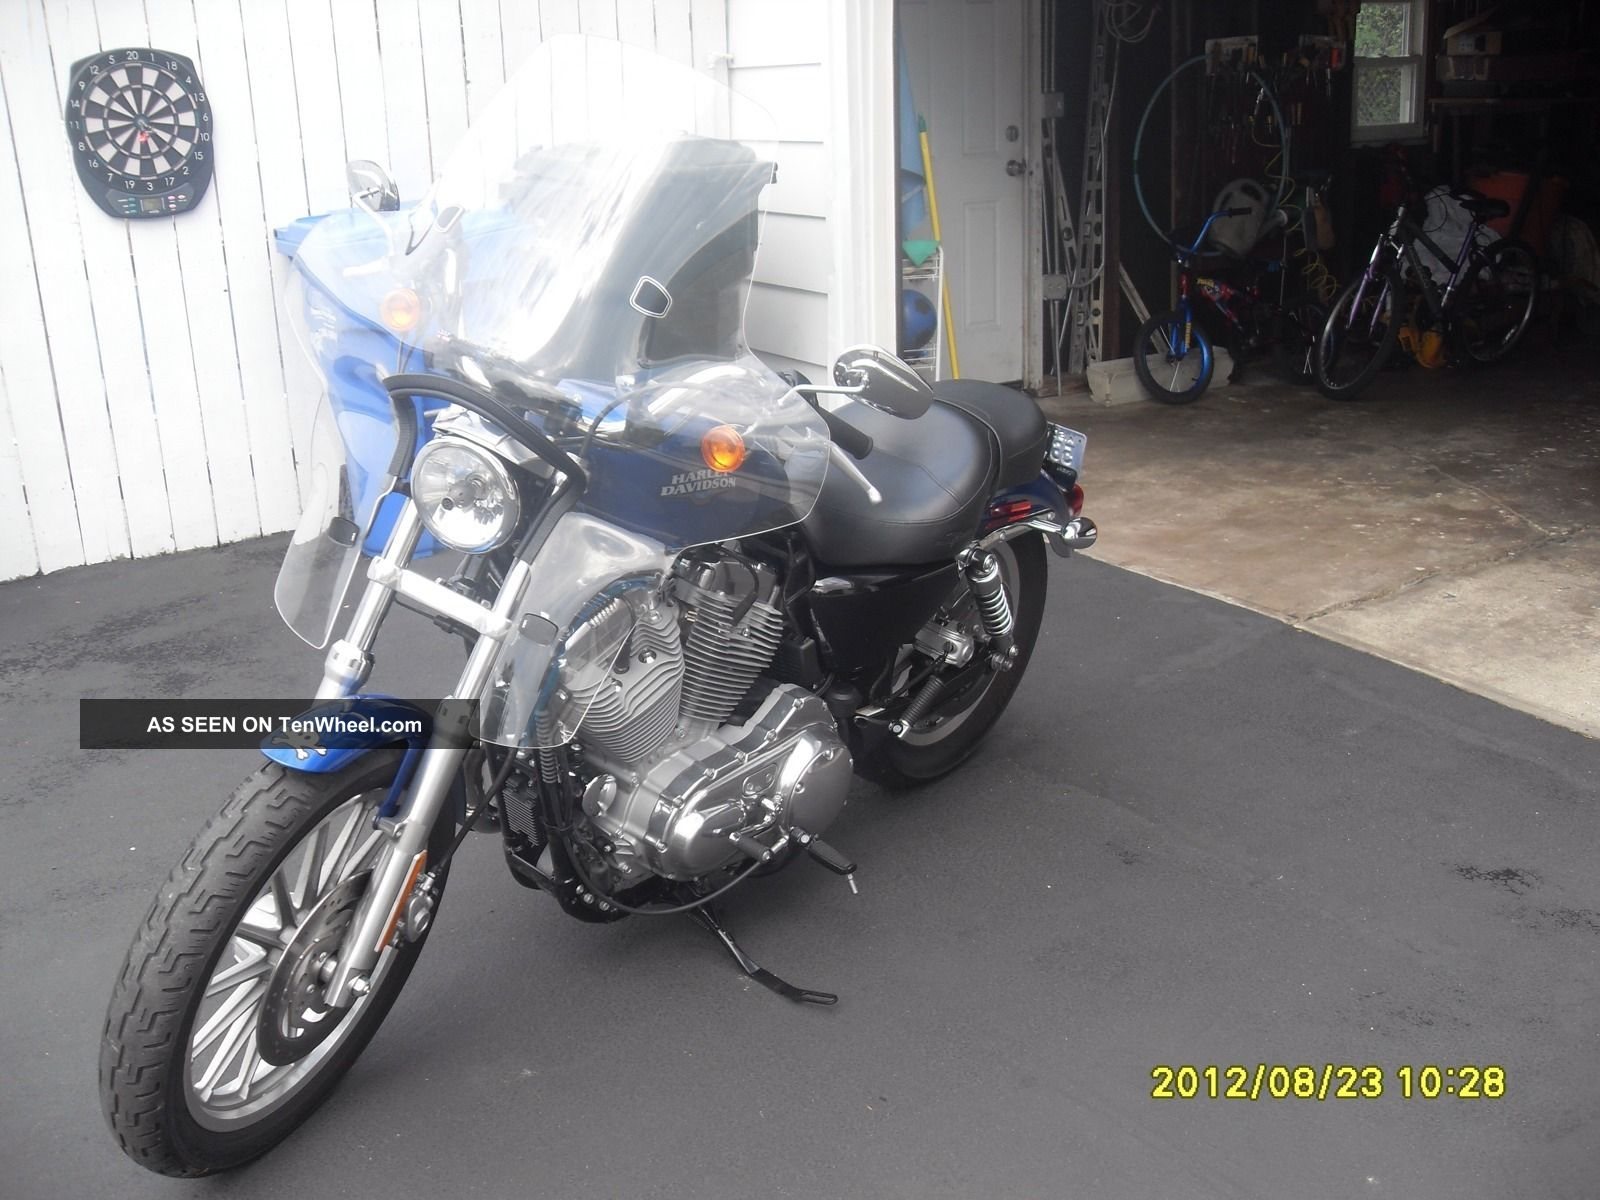 2010 Harley Davidson Sportster 883 Low Sportster photo